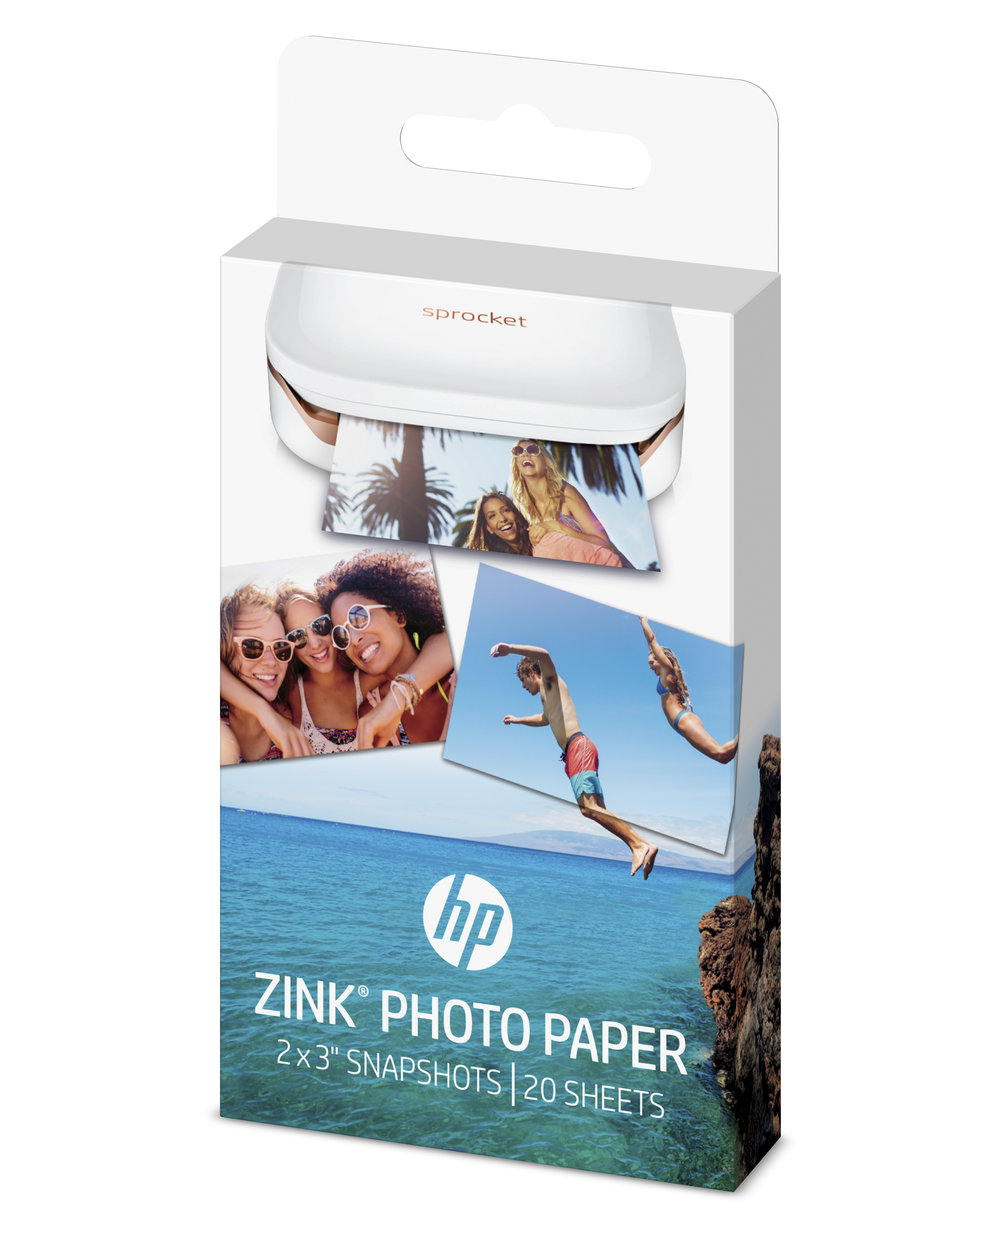 HP ZINK Photo Paper.jpg